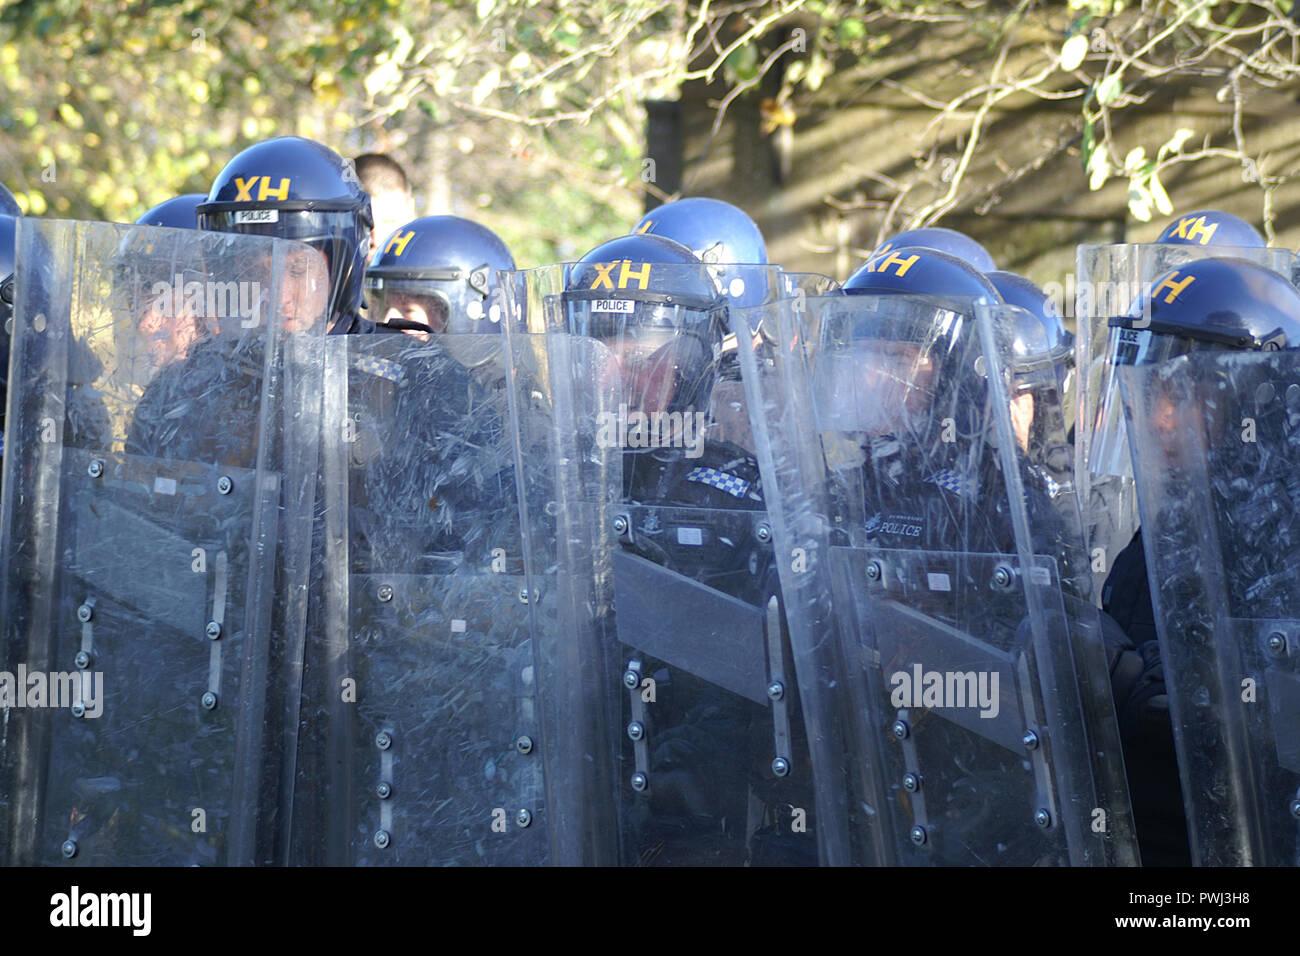 CROWD CONTROL public disorder, street riot, civil unrest, riot police unit - Stock Image